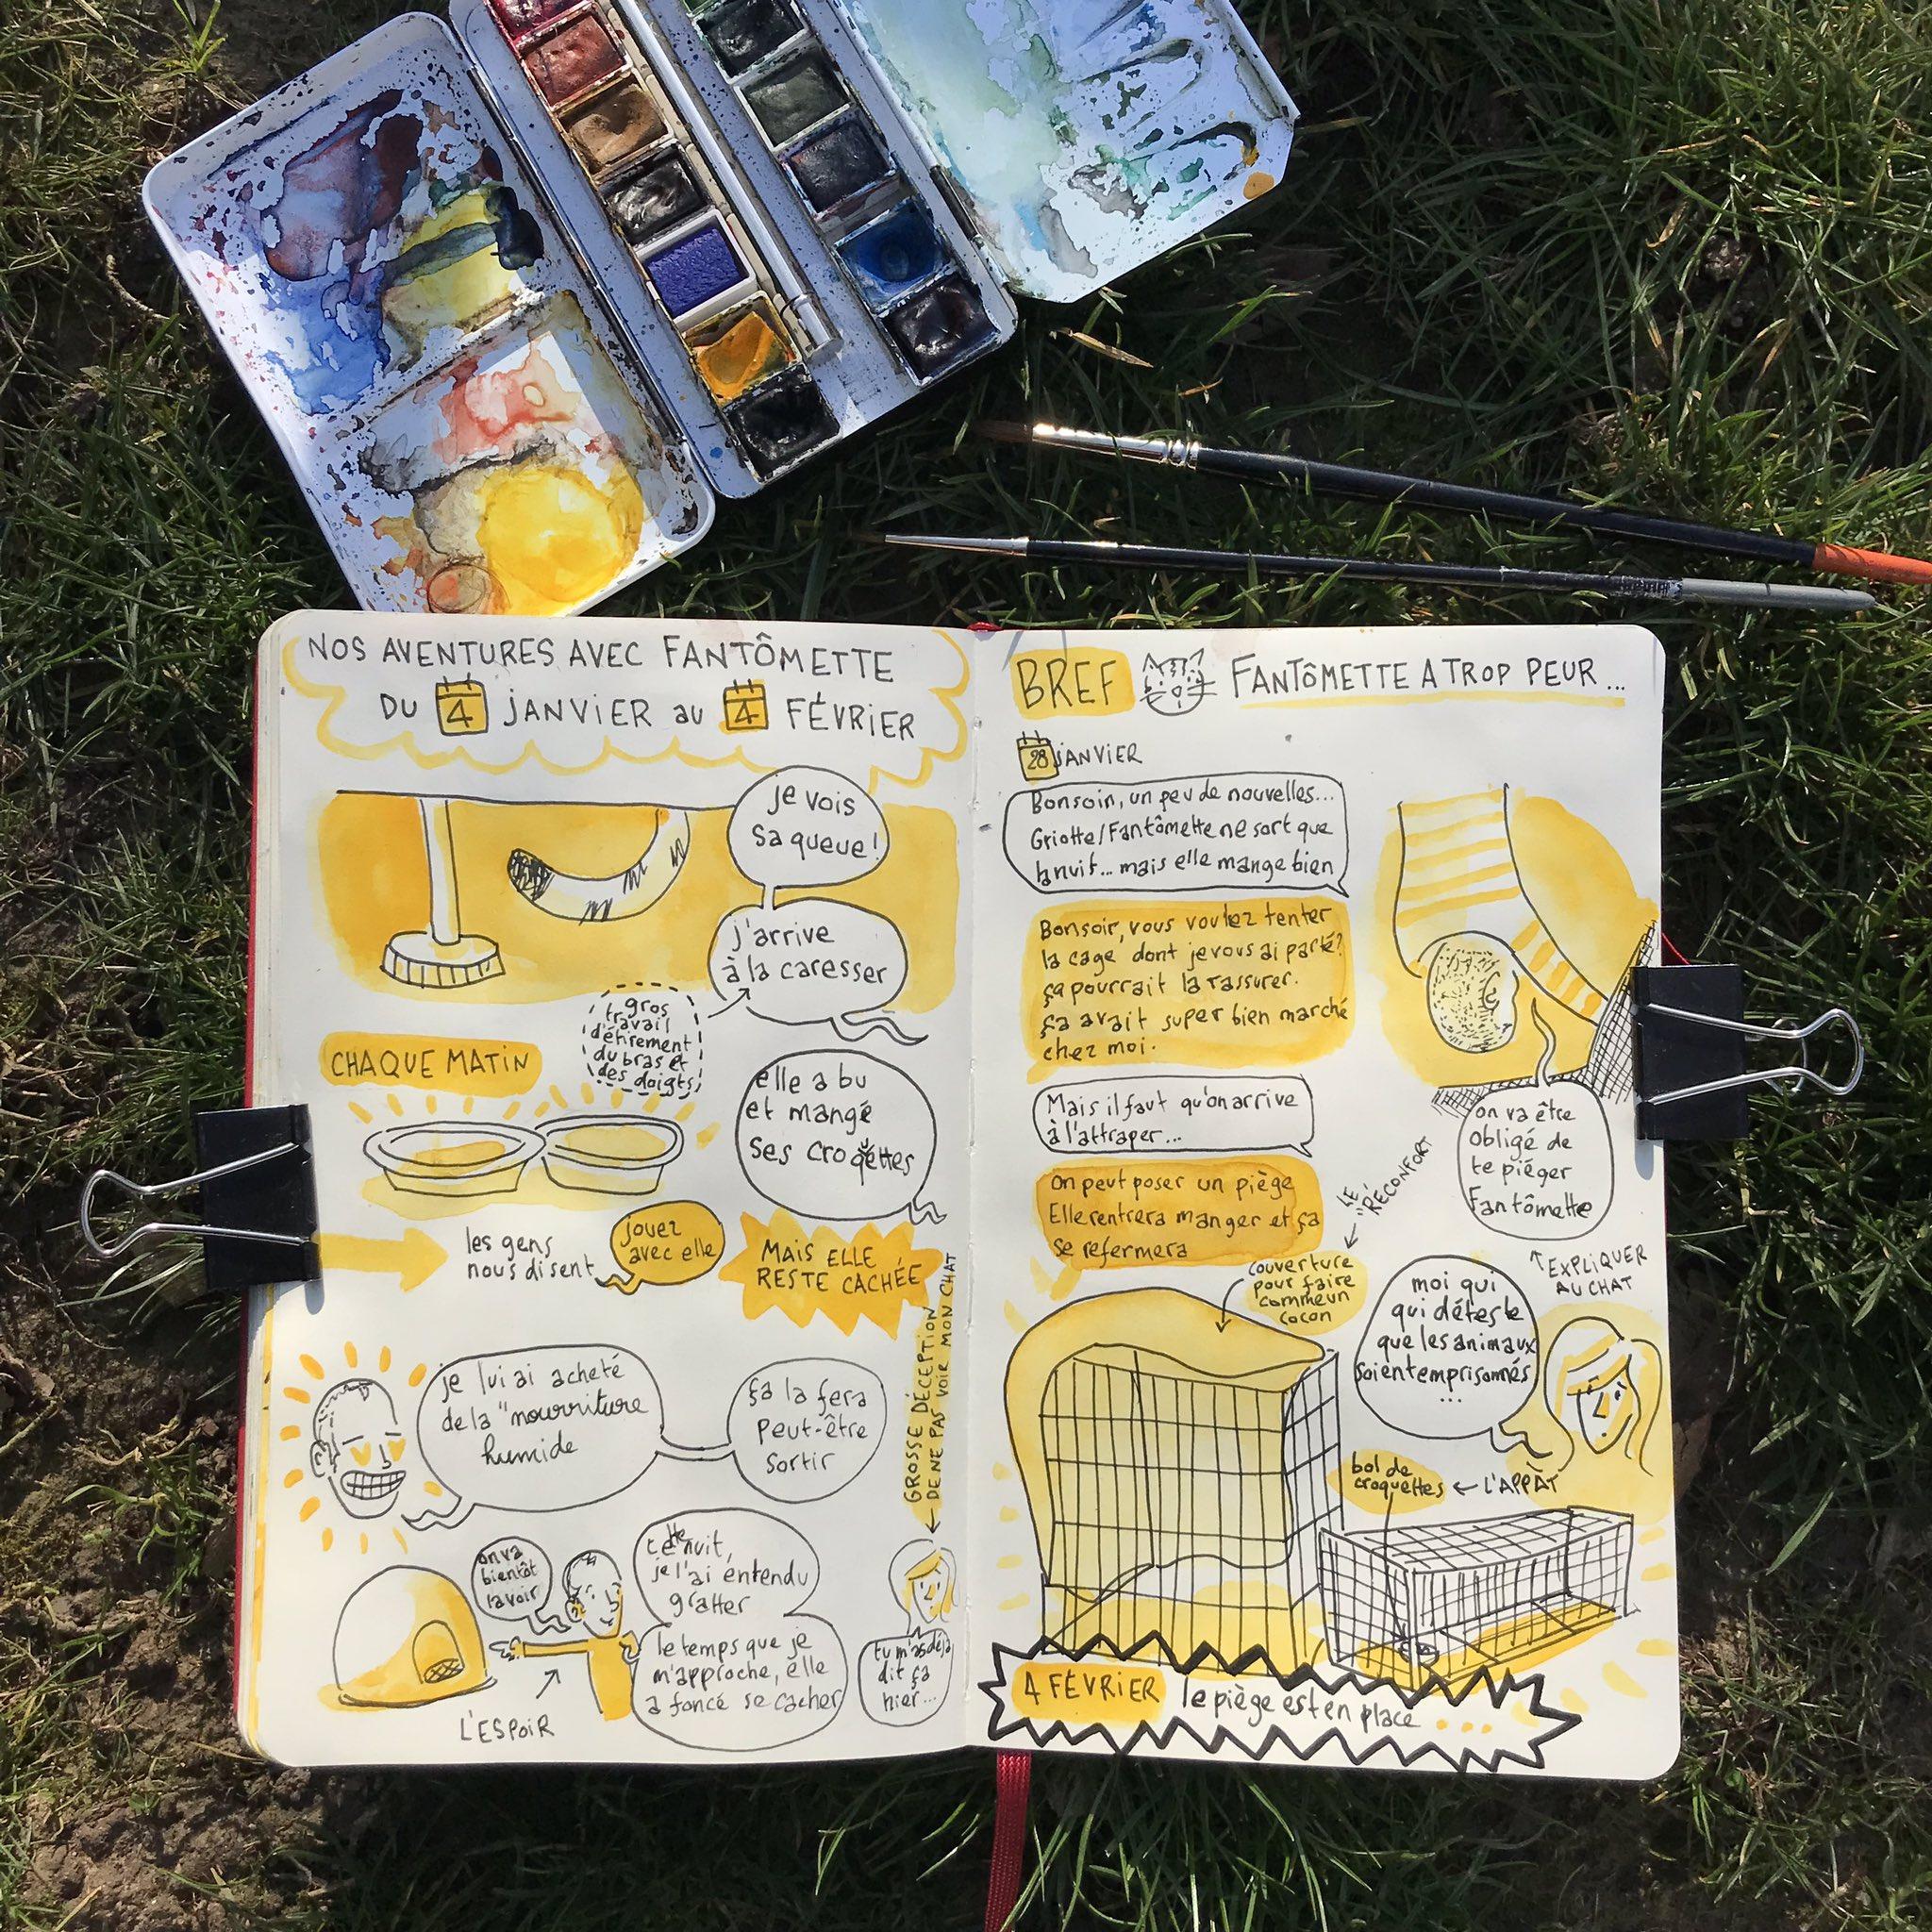 Quand tu adoptes un petit #chat 😻 (épisode 9)  😍joie de dessiner DEHORS 😍  😘 @VVisine @NaCrosnier @EthelDrey @loreleymac @JordanePlvln   #sketchbook #cat #aquarelle #watercolor #carnetdevoyage #kitty #kitten #catlover #design #fantomette https://t.co/rHxx1Xqe80